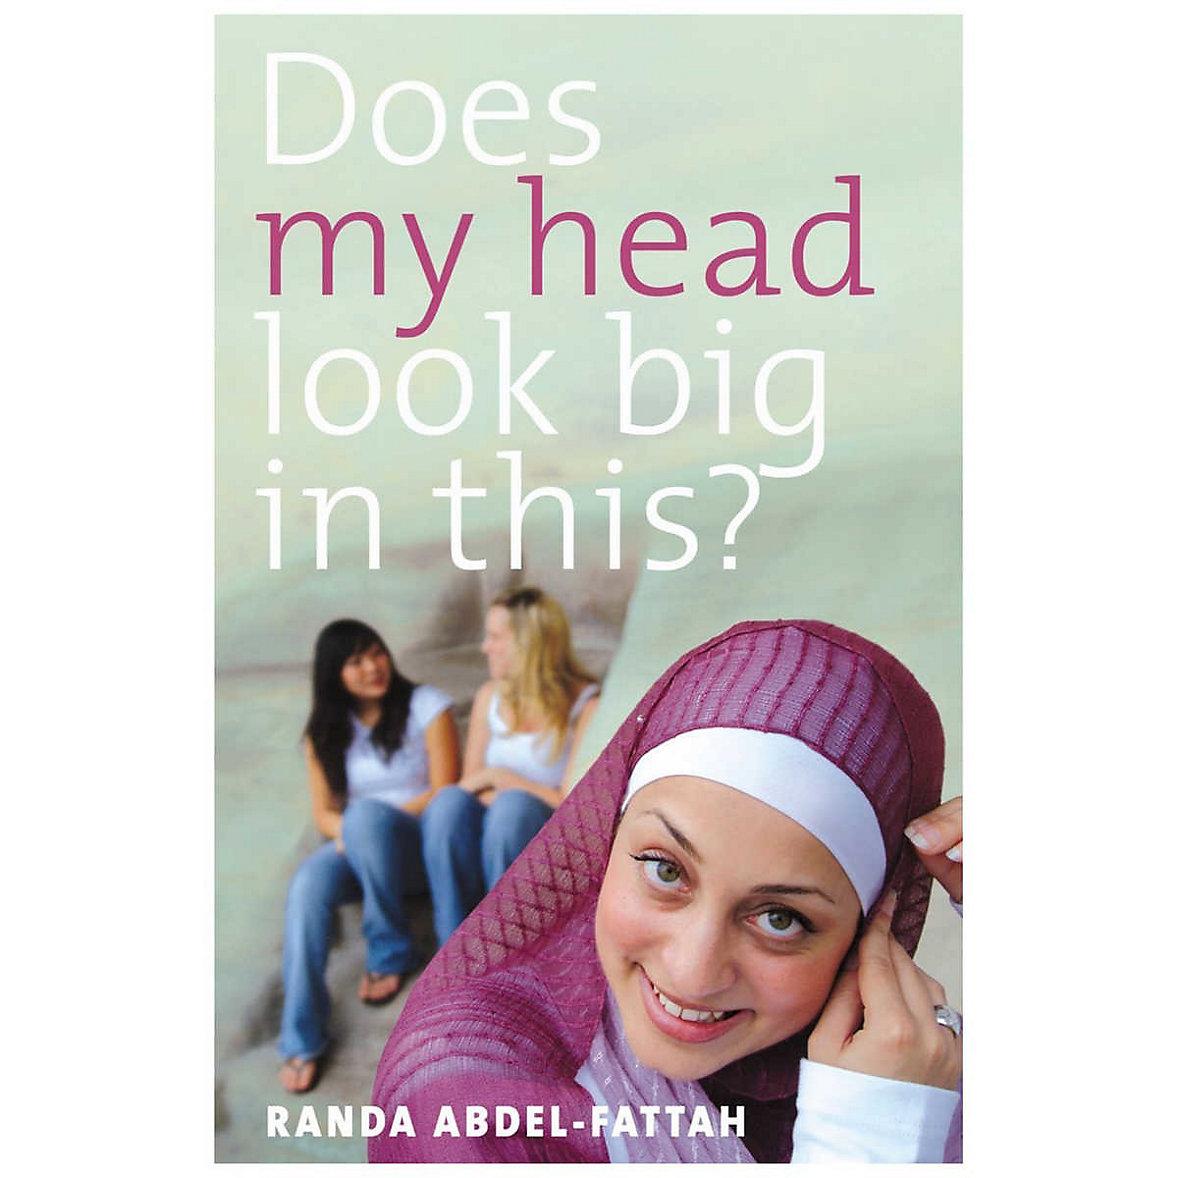 Does my head look big in this? - Randa Abdel Fattah